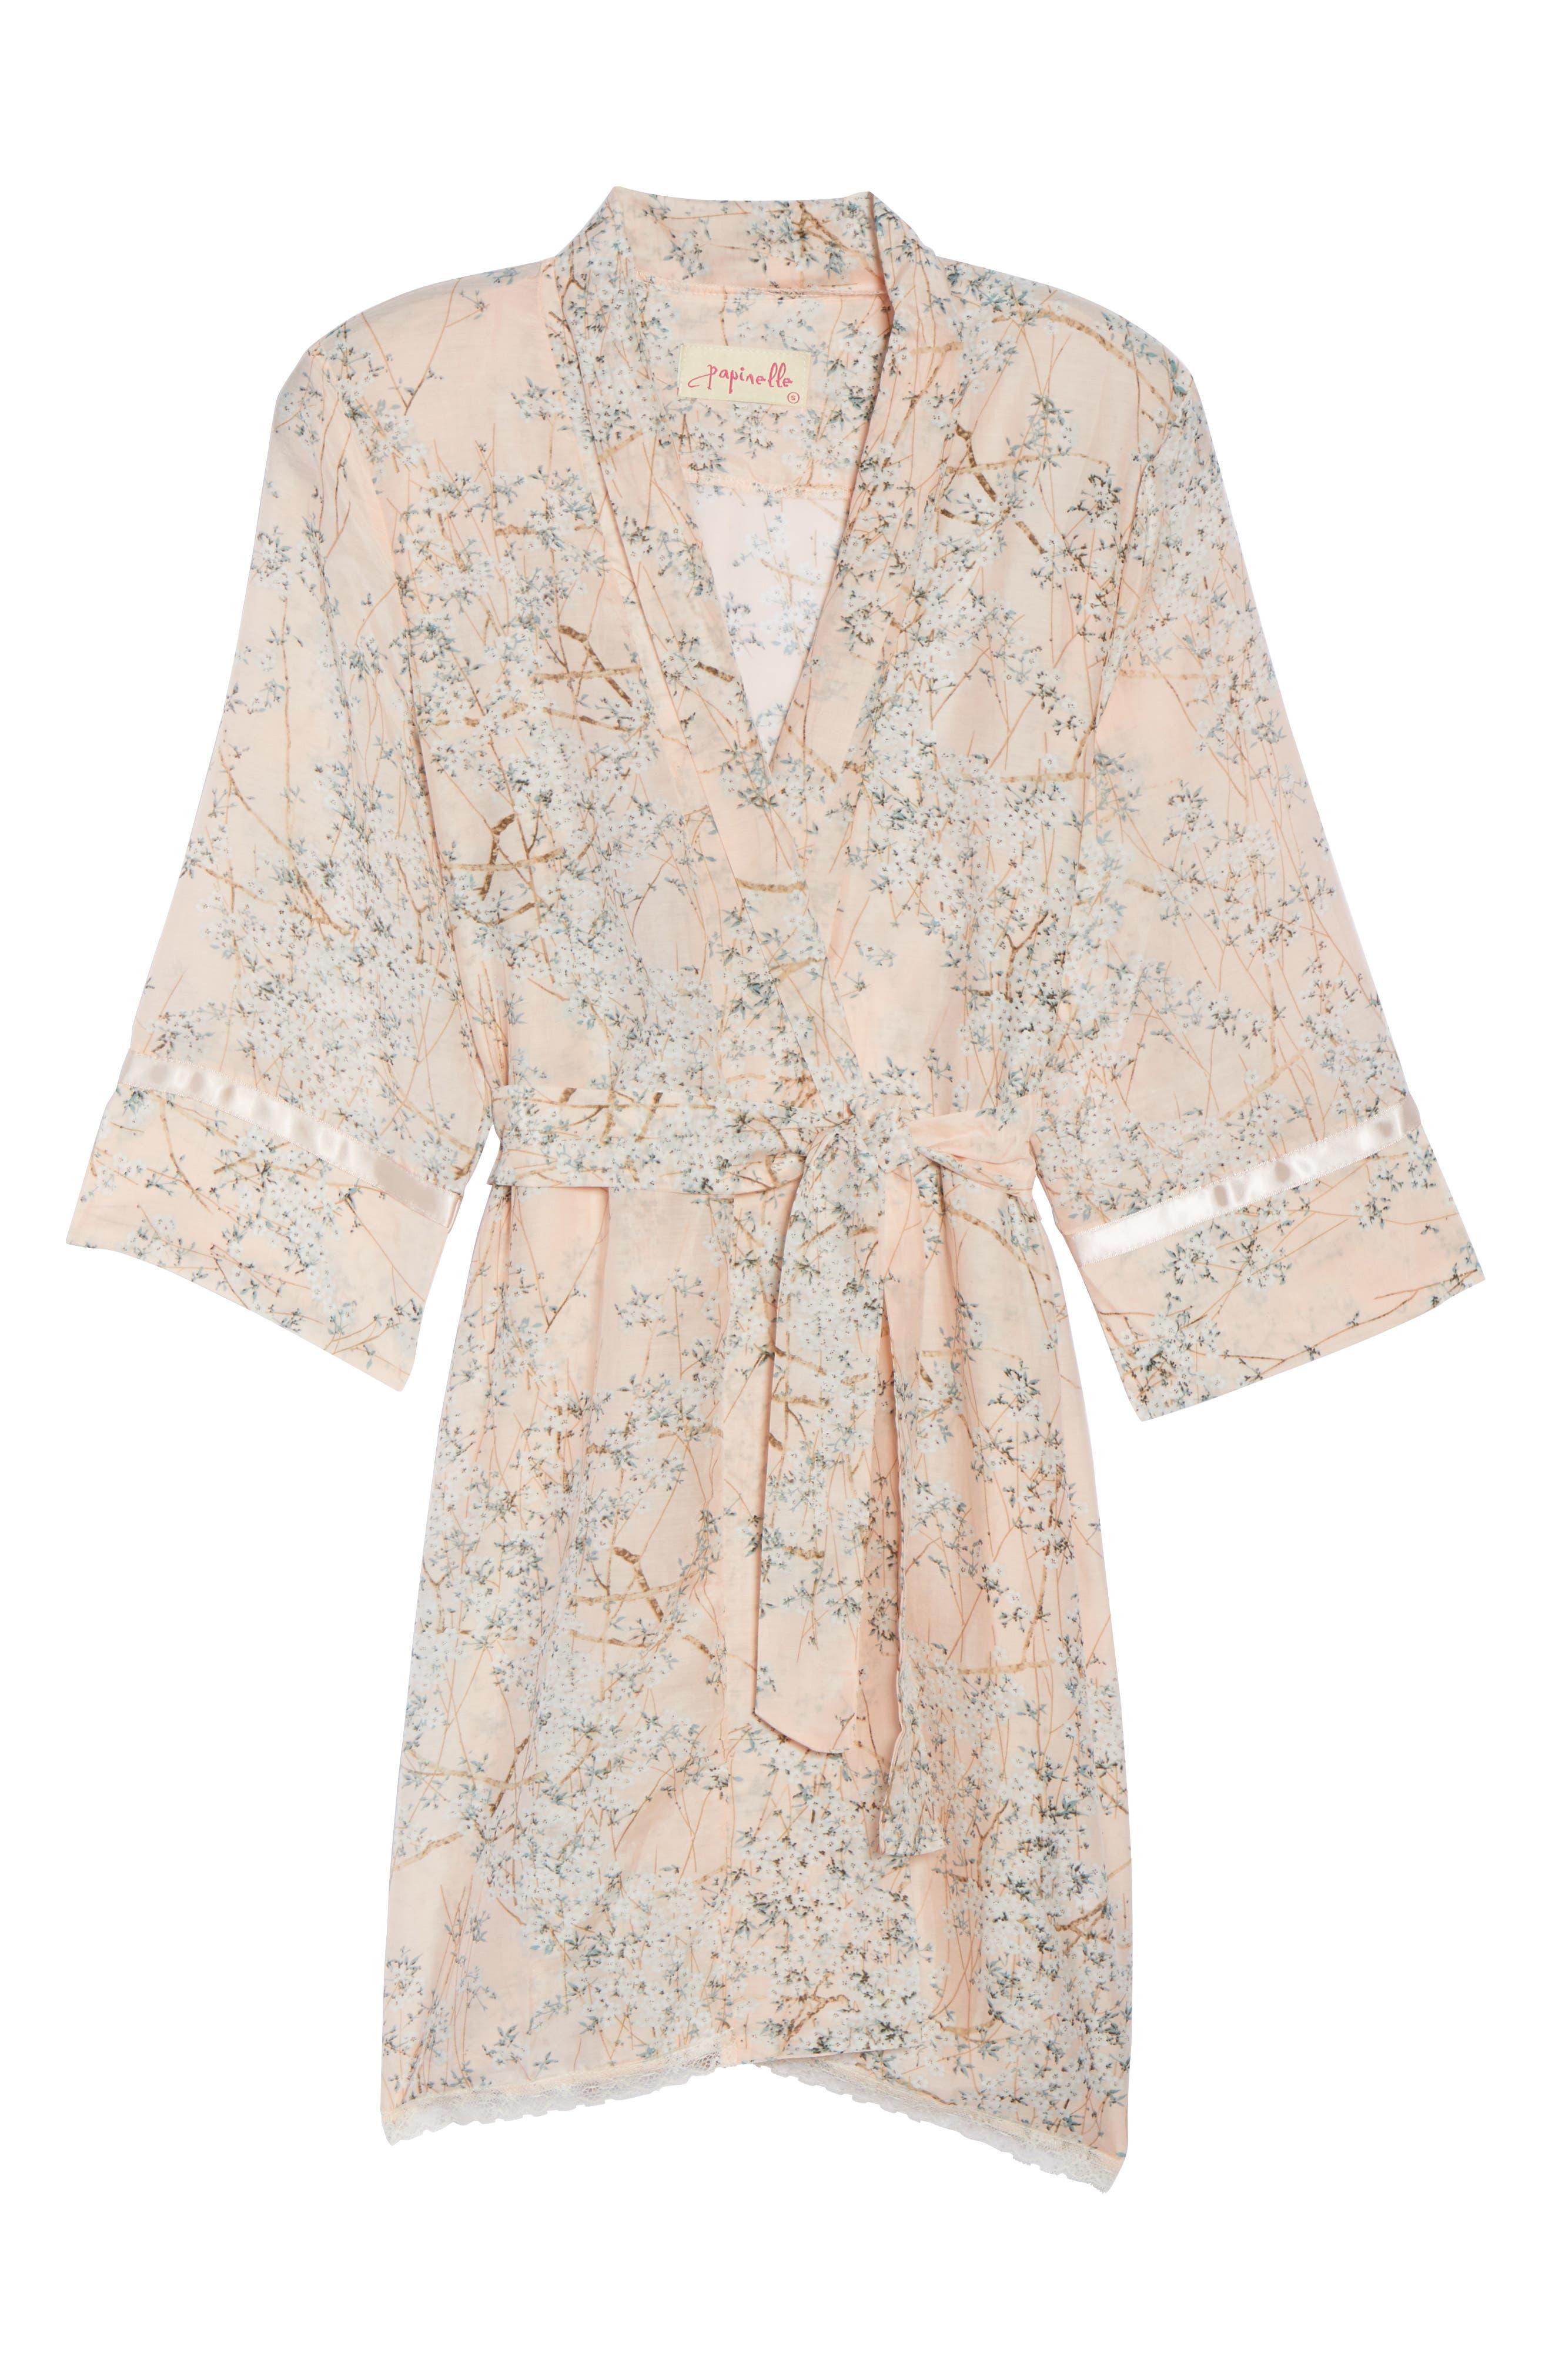 PAPINELLE,                             Cherry Blossom Cotton & Silk Short Robe,                             Alternate thumbnail 6, color,                             950